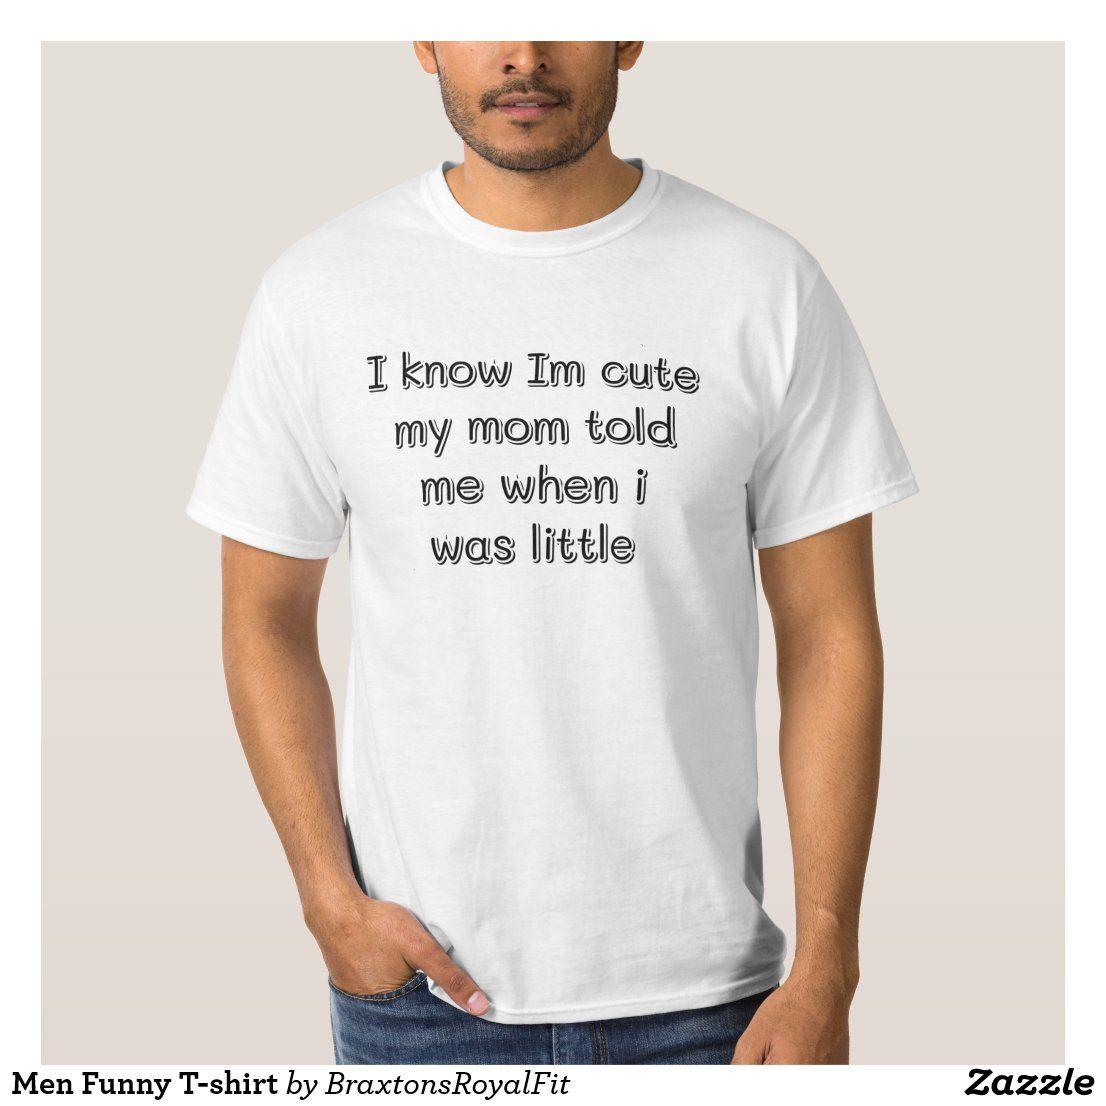 Men Funny T Shirt Zazzle Com T Shirt Costumes Shirts With Sayings Funny Shirt Sayings